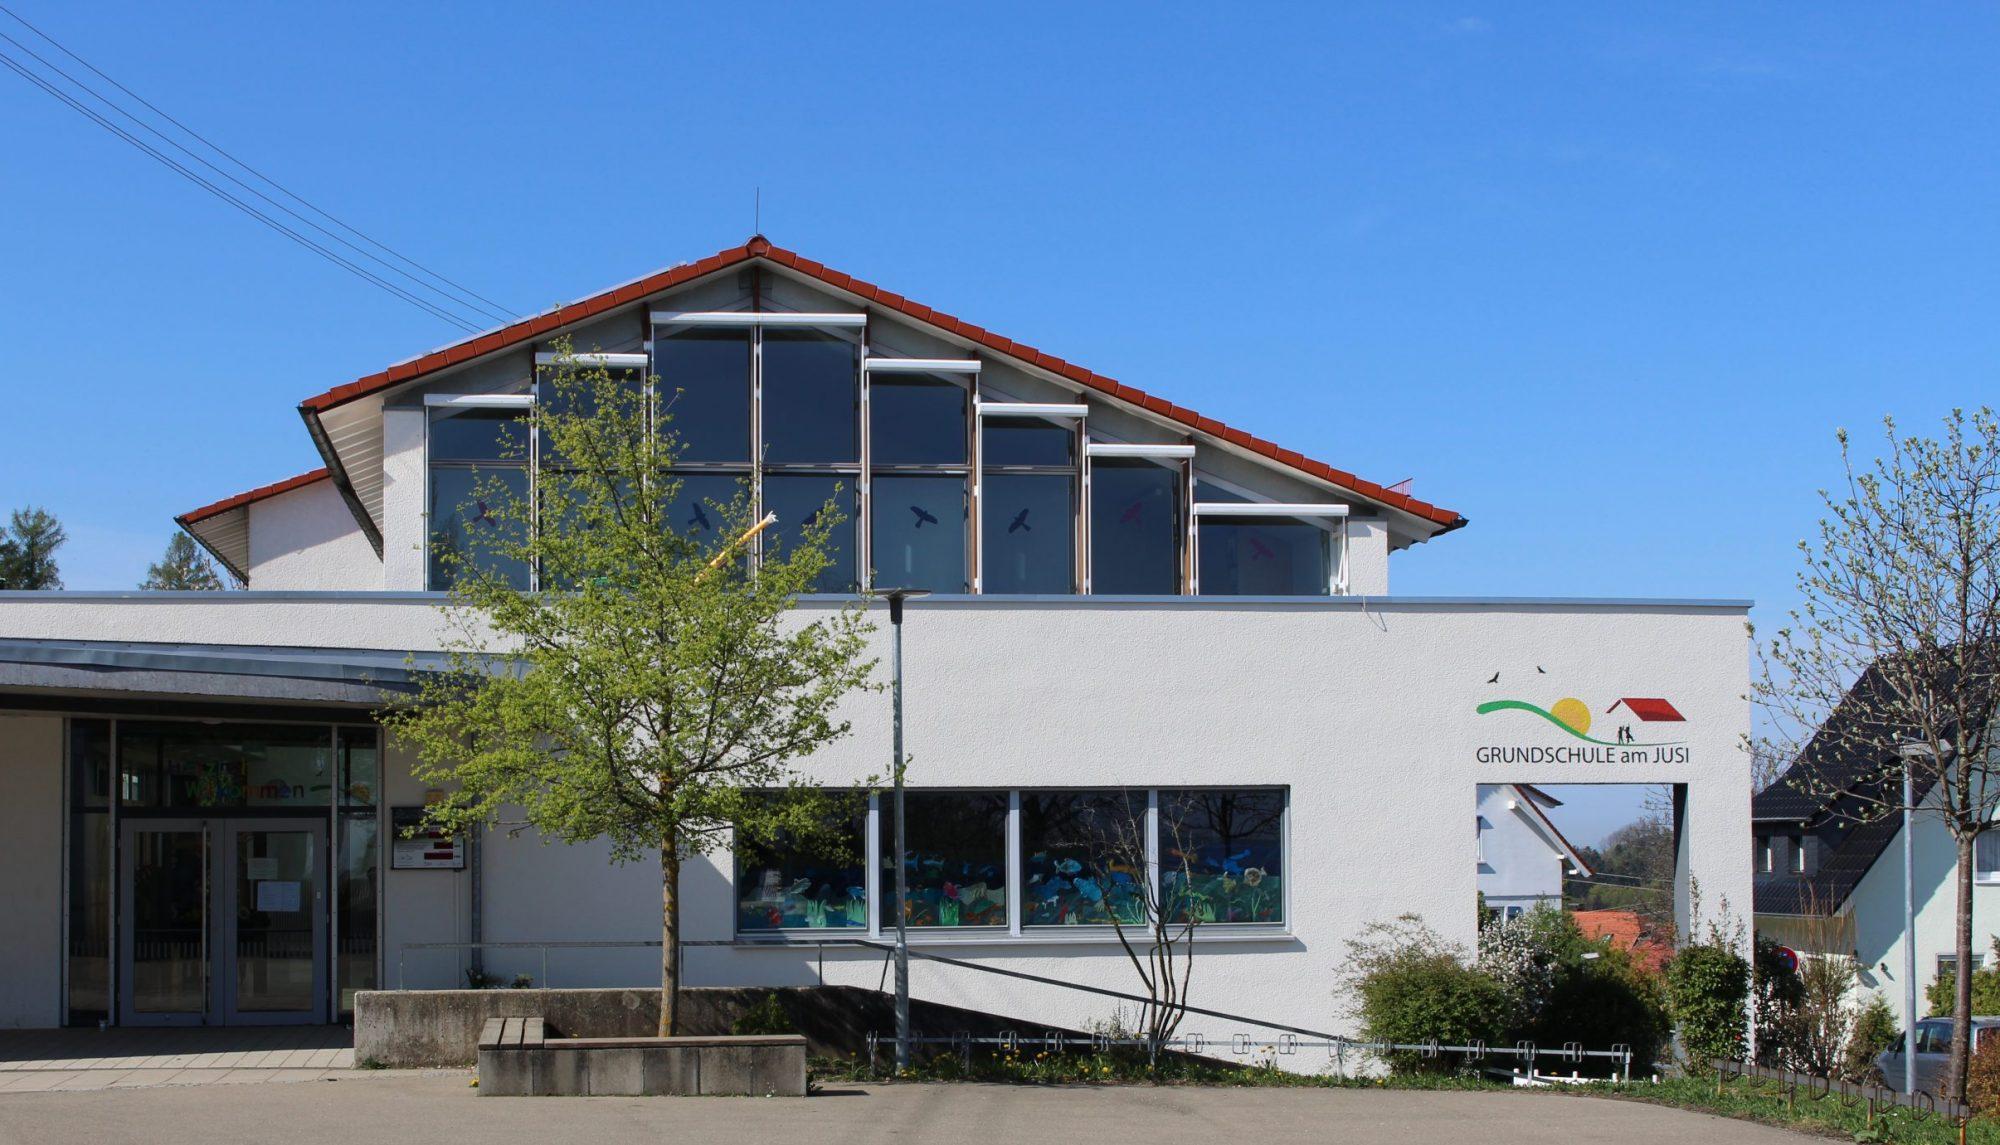 Grundschule am Jusi